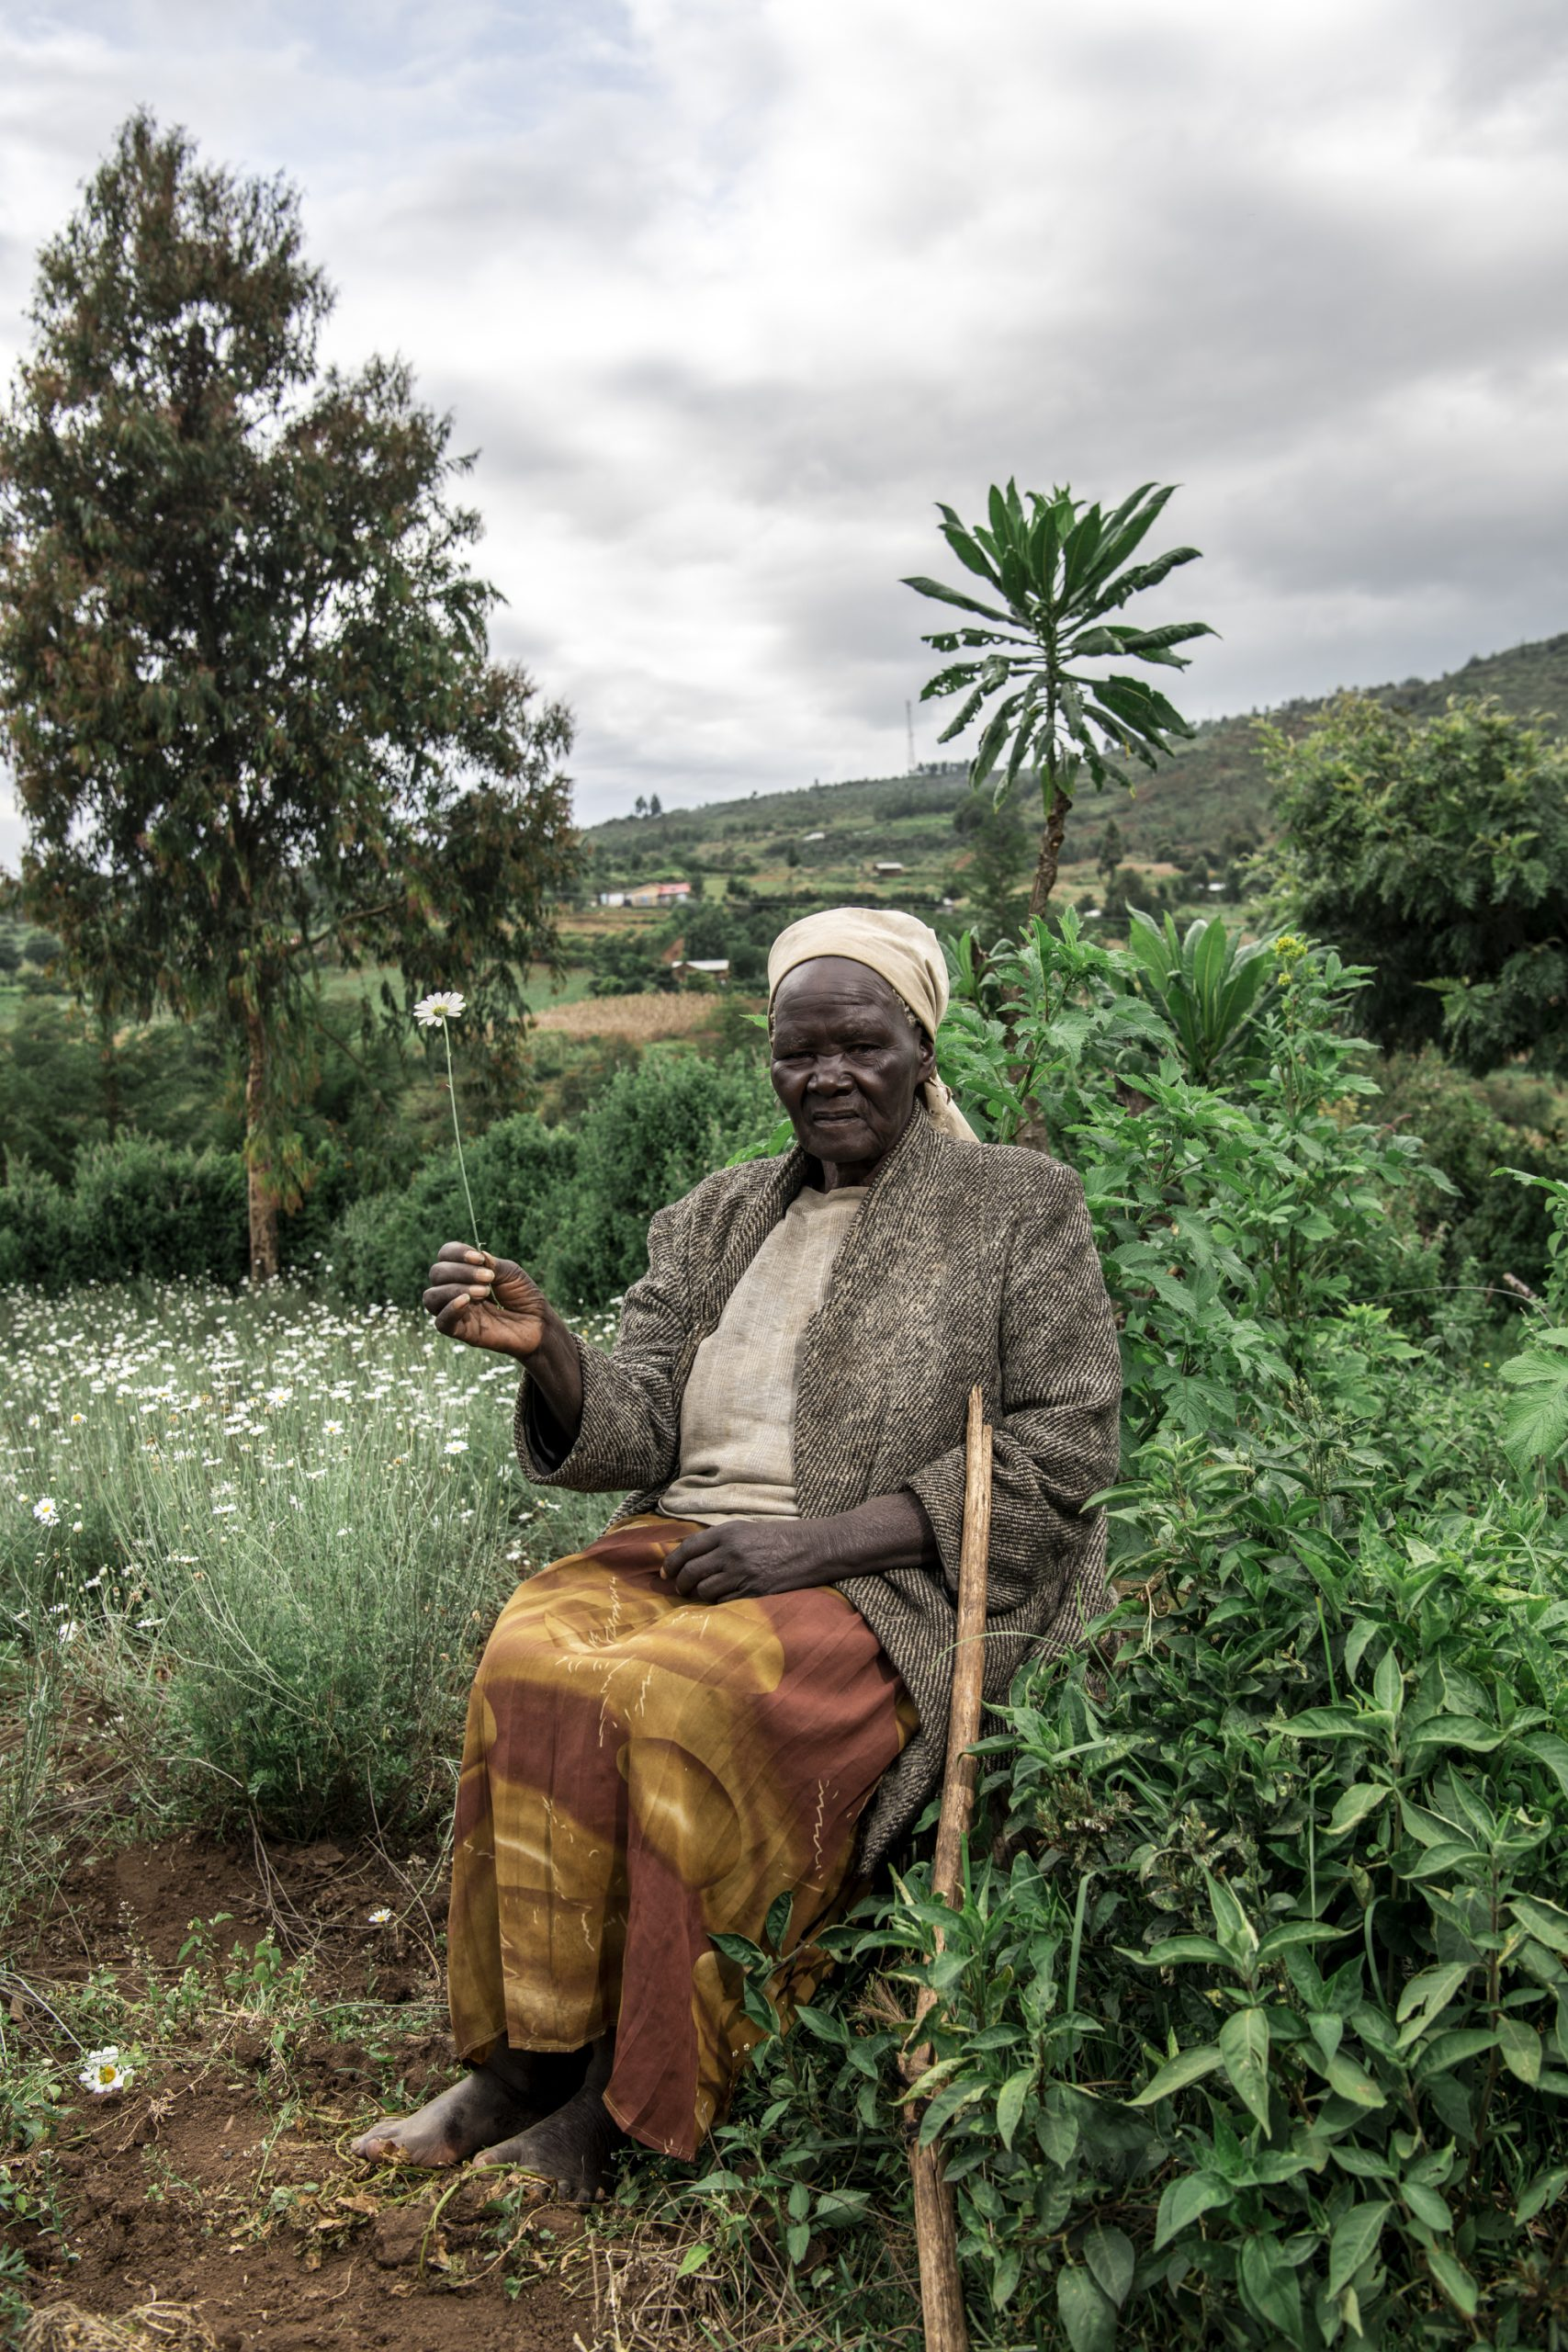 Color portrait photograph of a female farmer in Kenya - Visual Storytelling Award